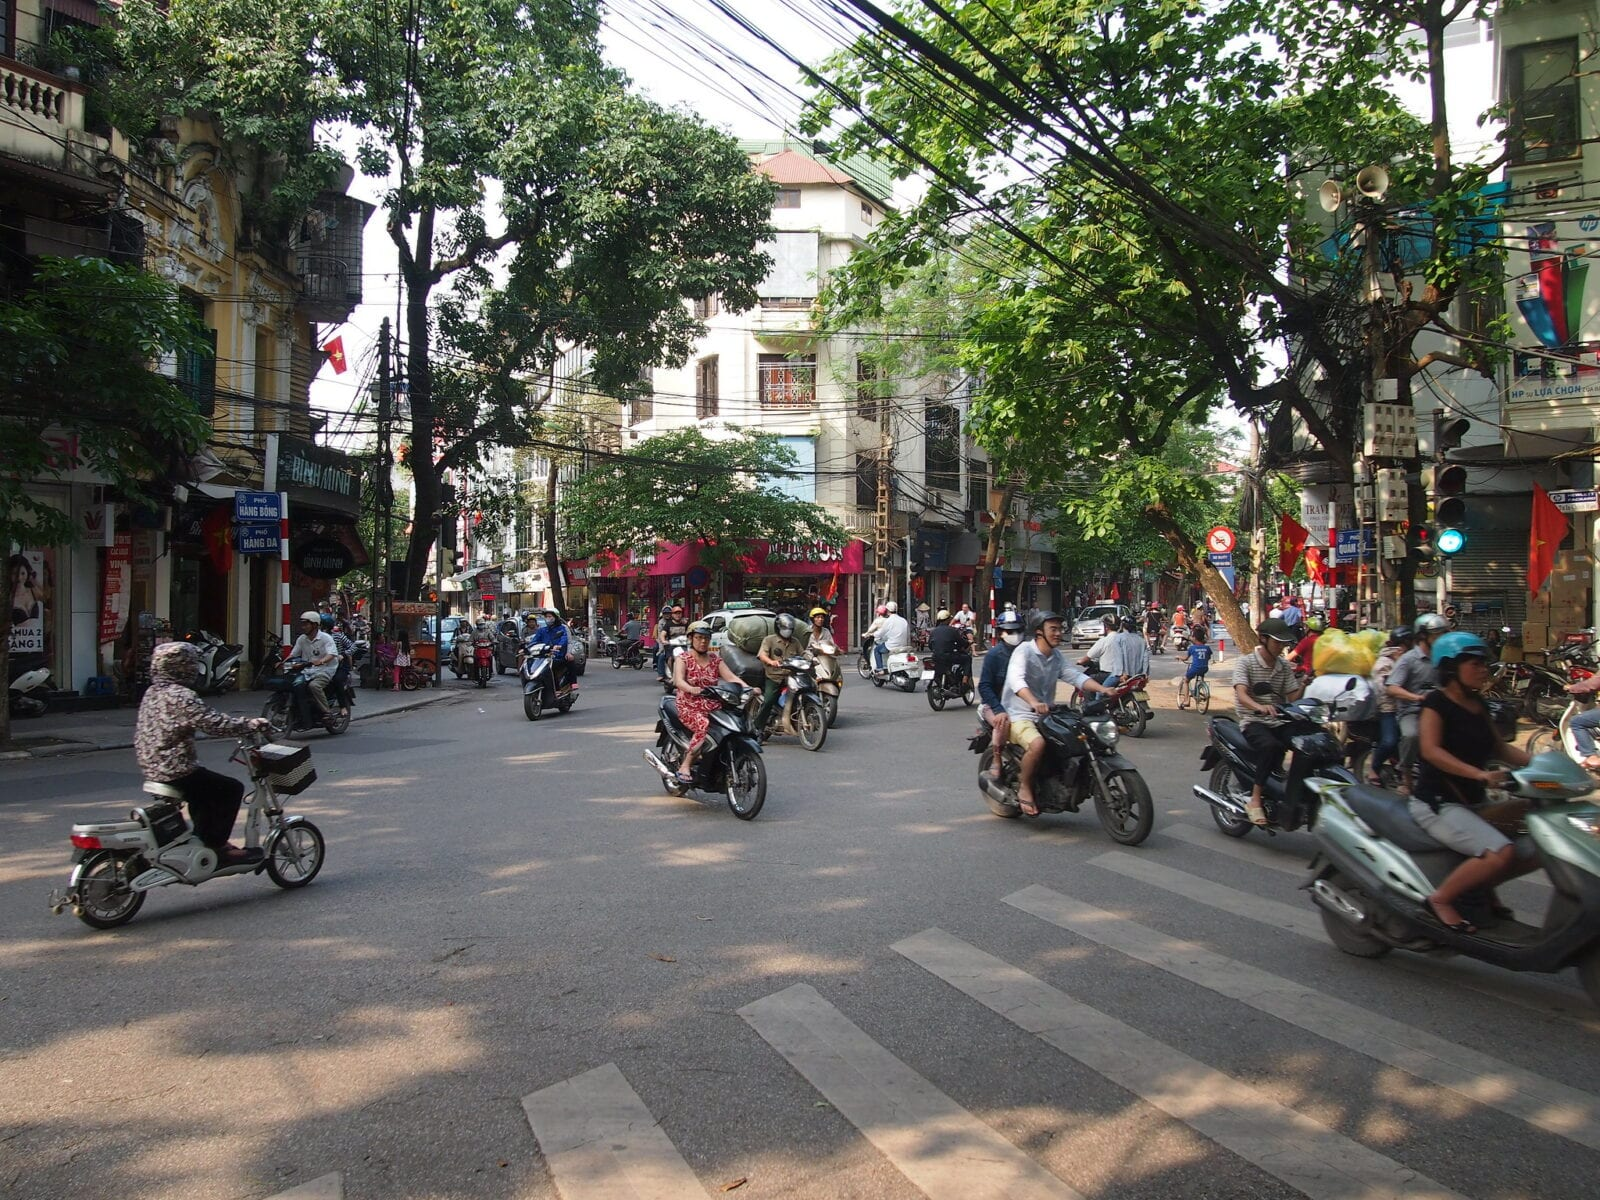 Image of motorbike riders zipping through the streets in Hanoi